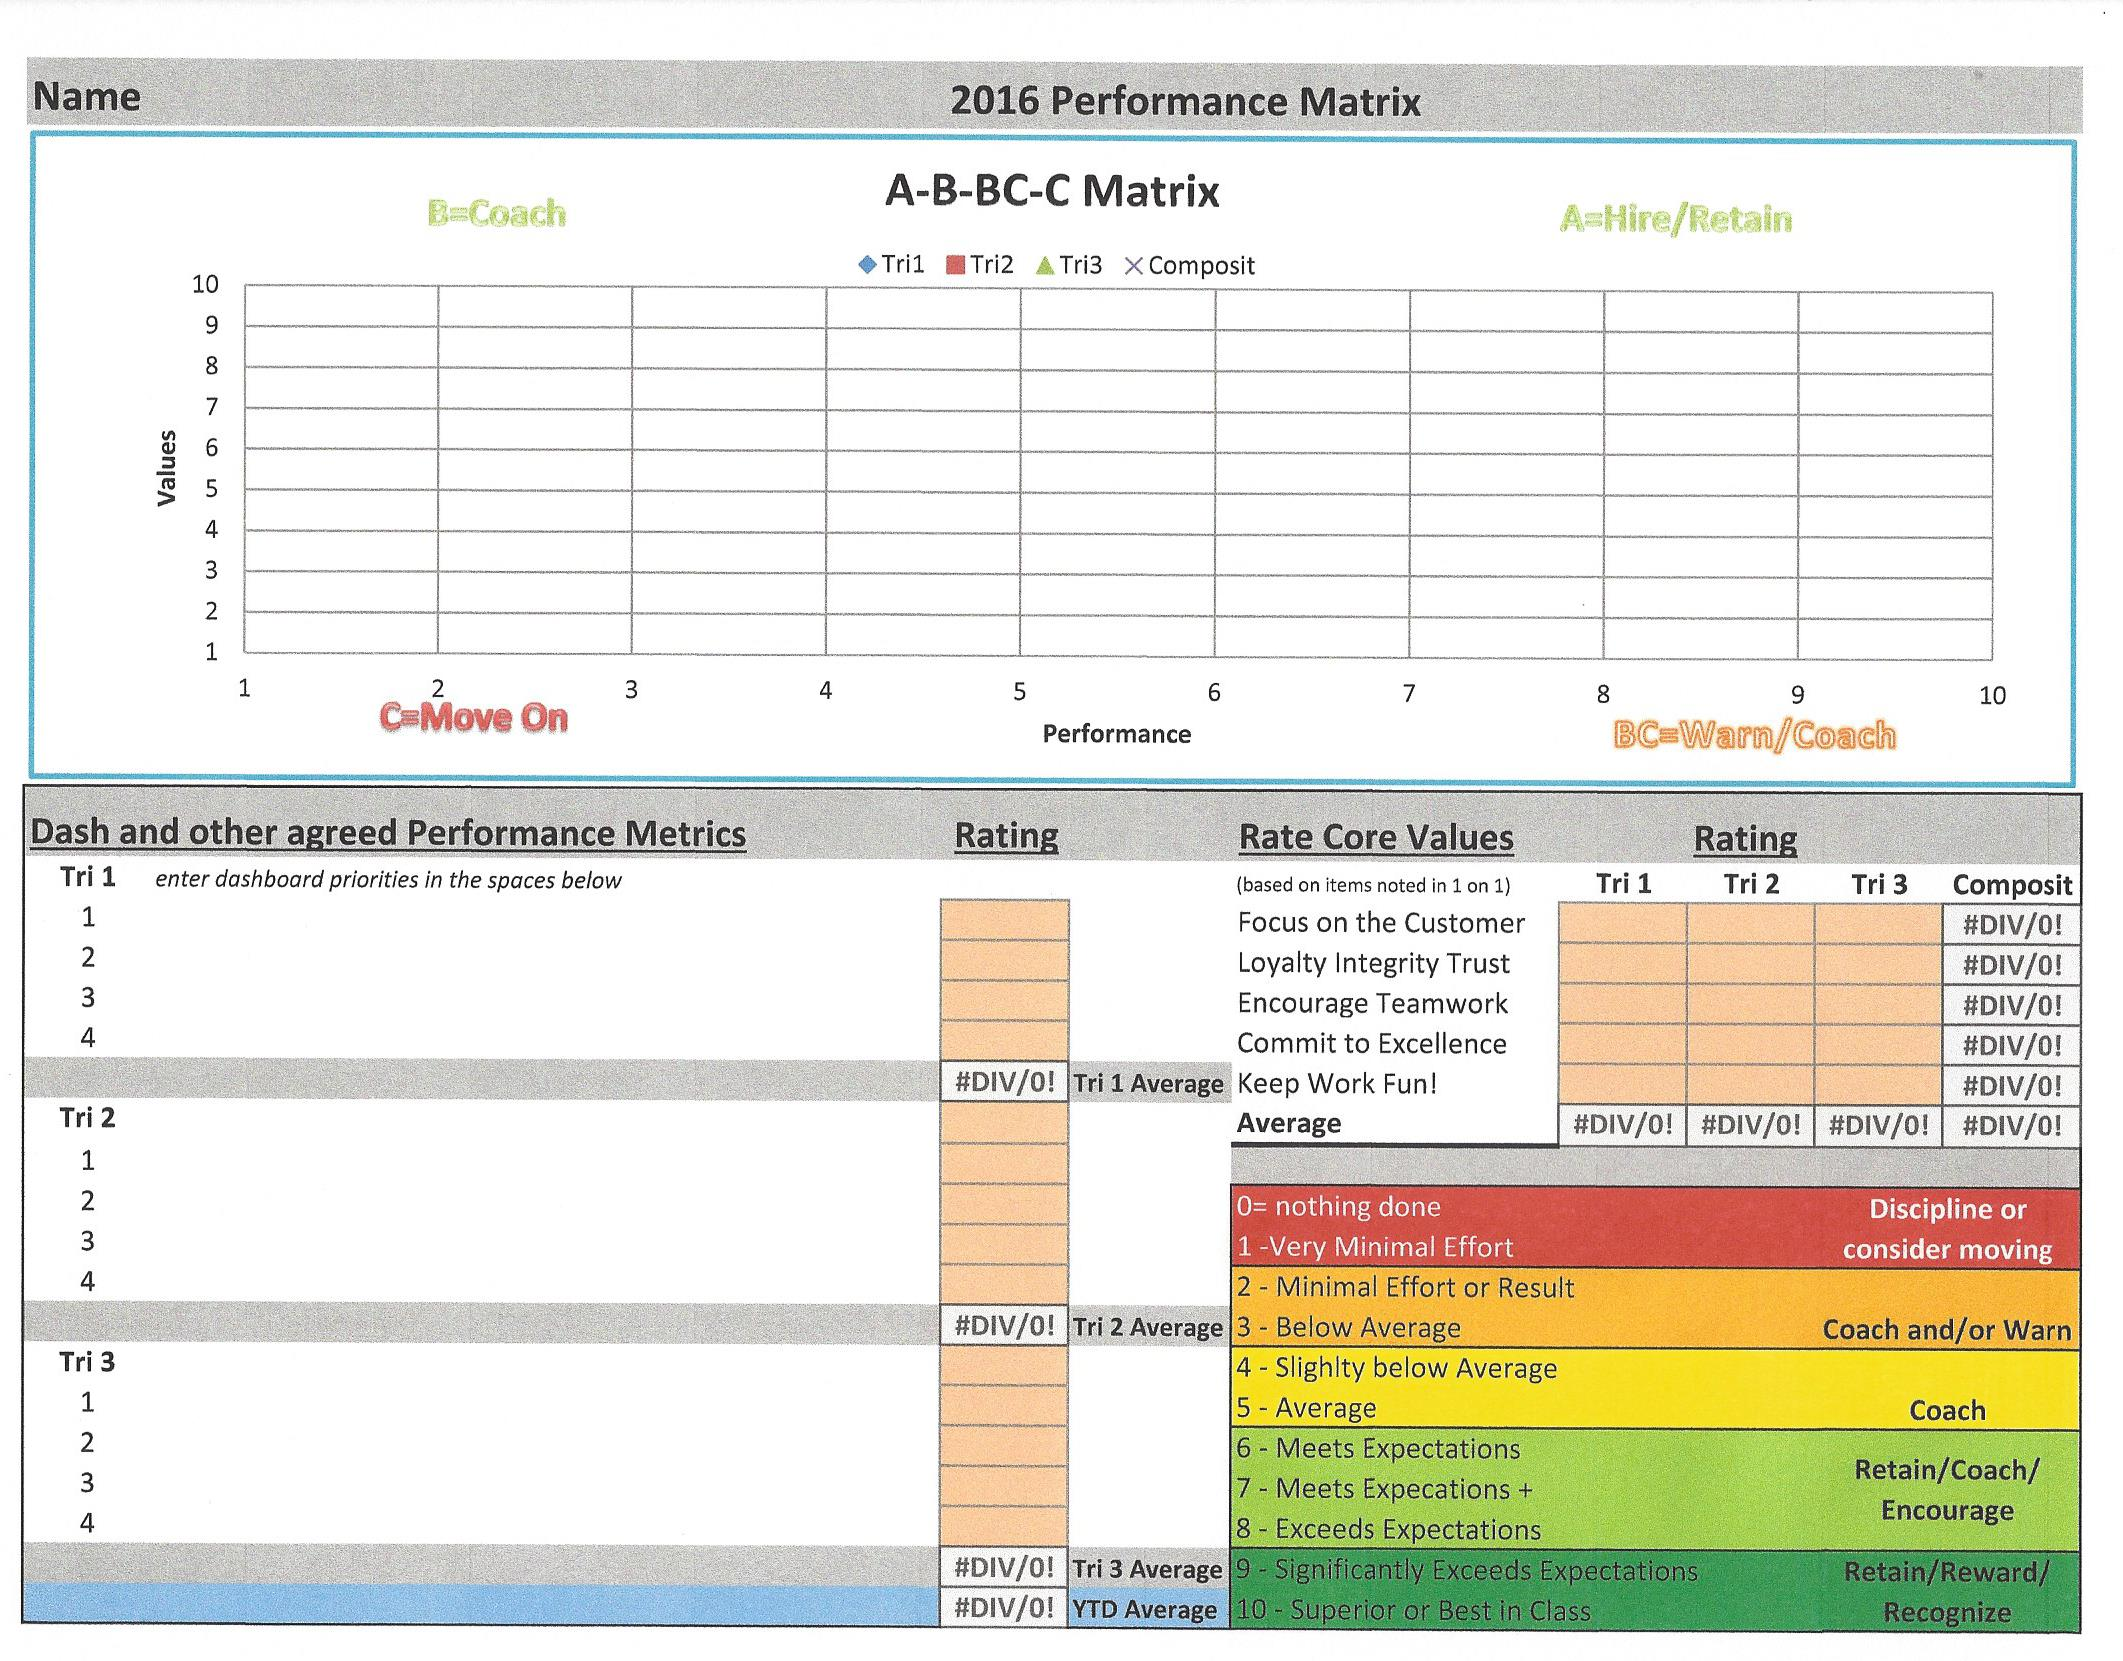 Flecks A-B-BC-C Performance Matrix.jpg